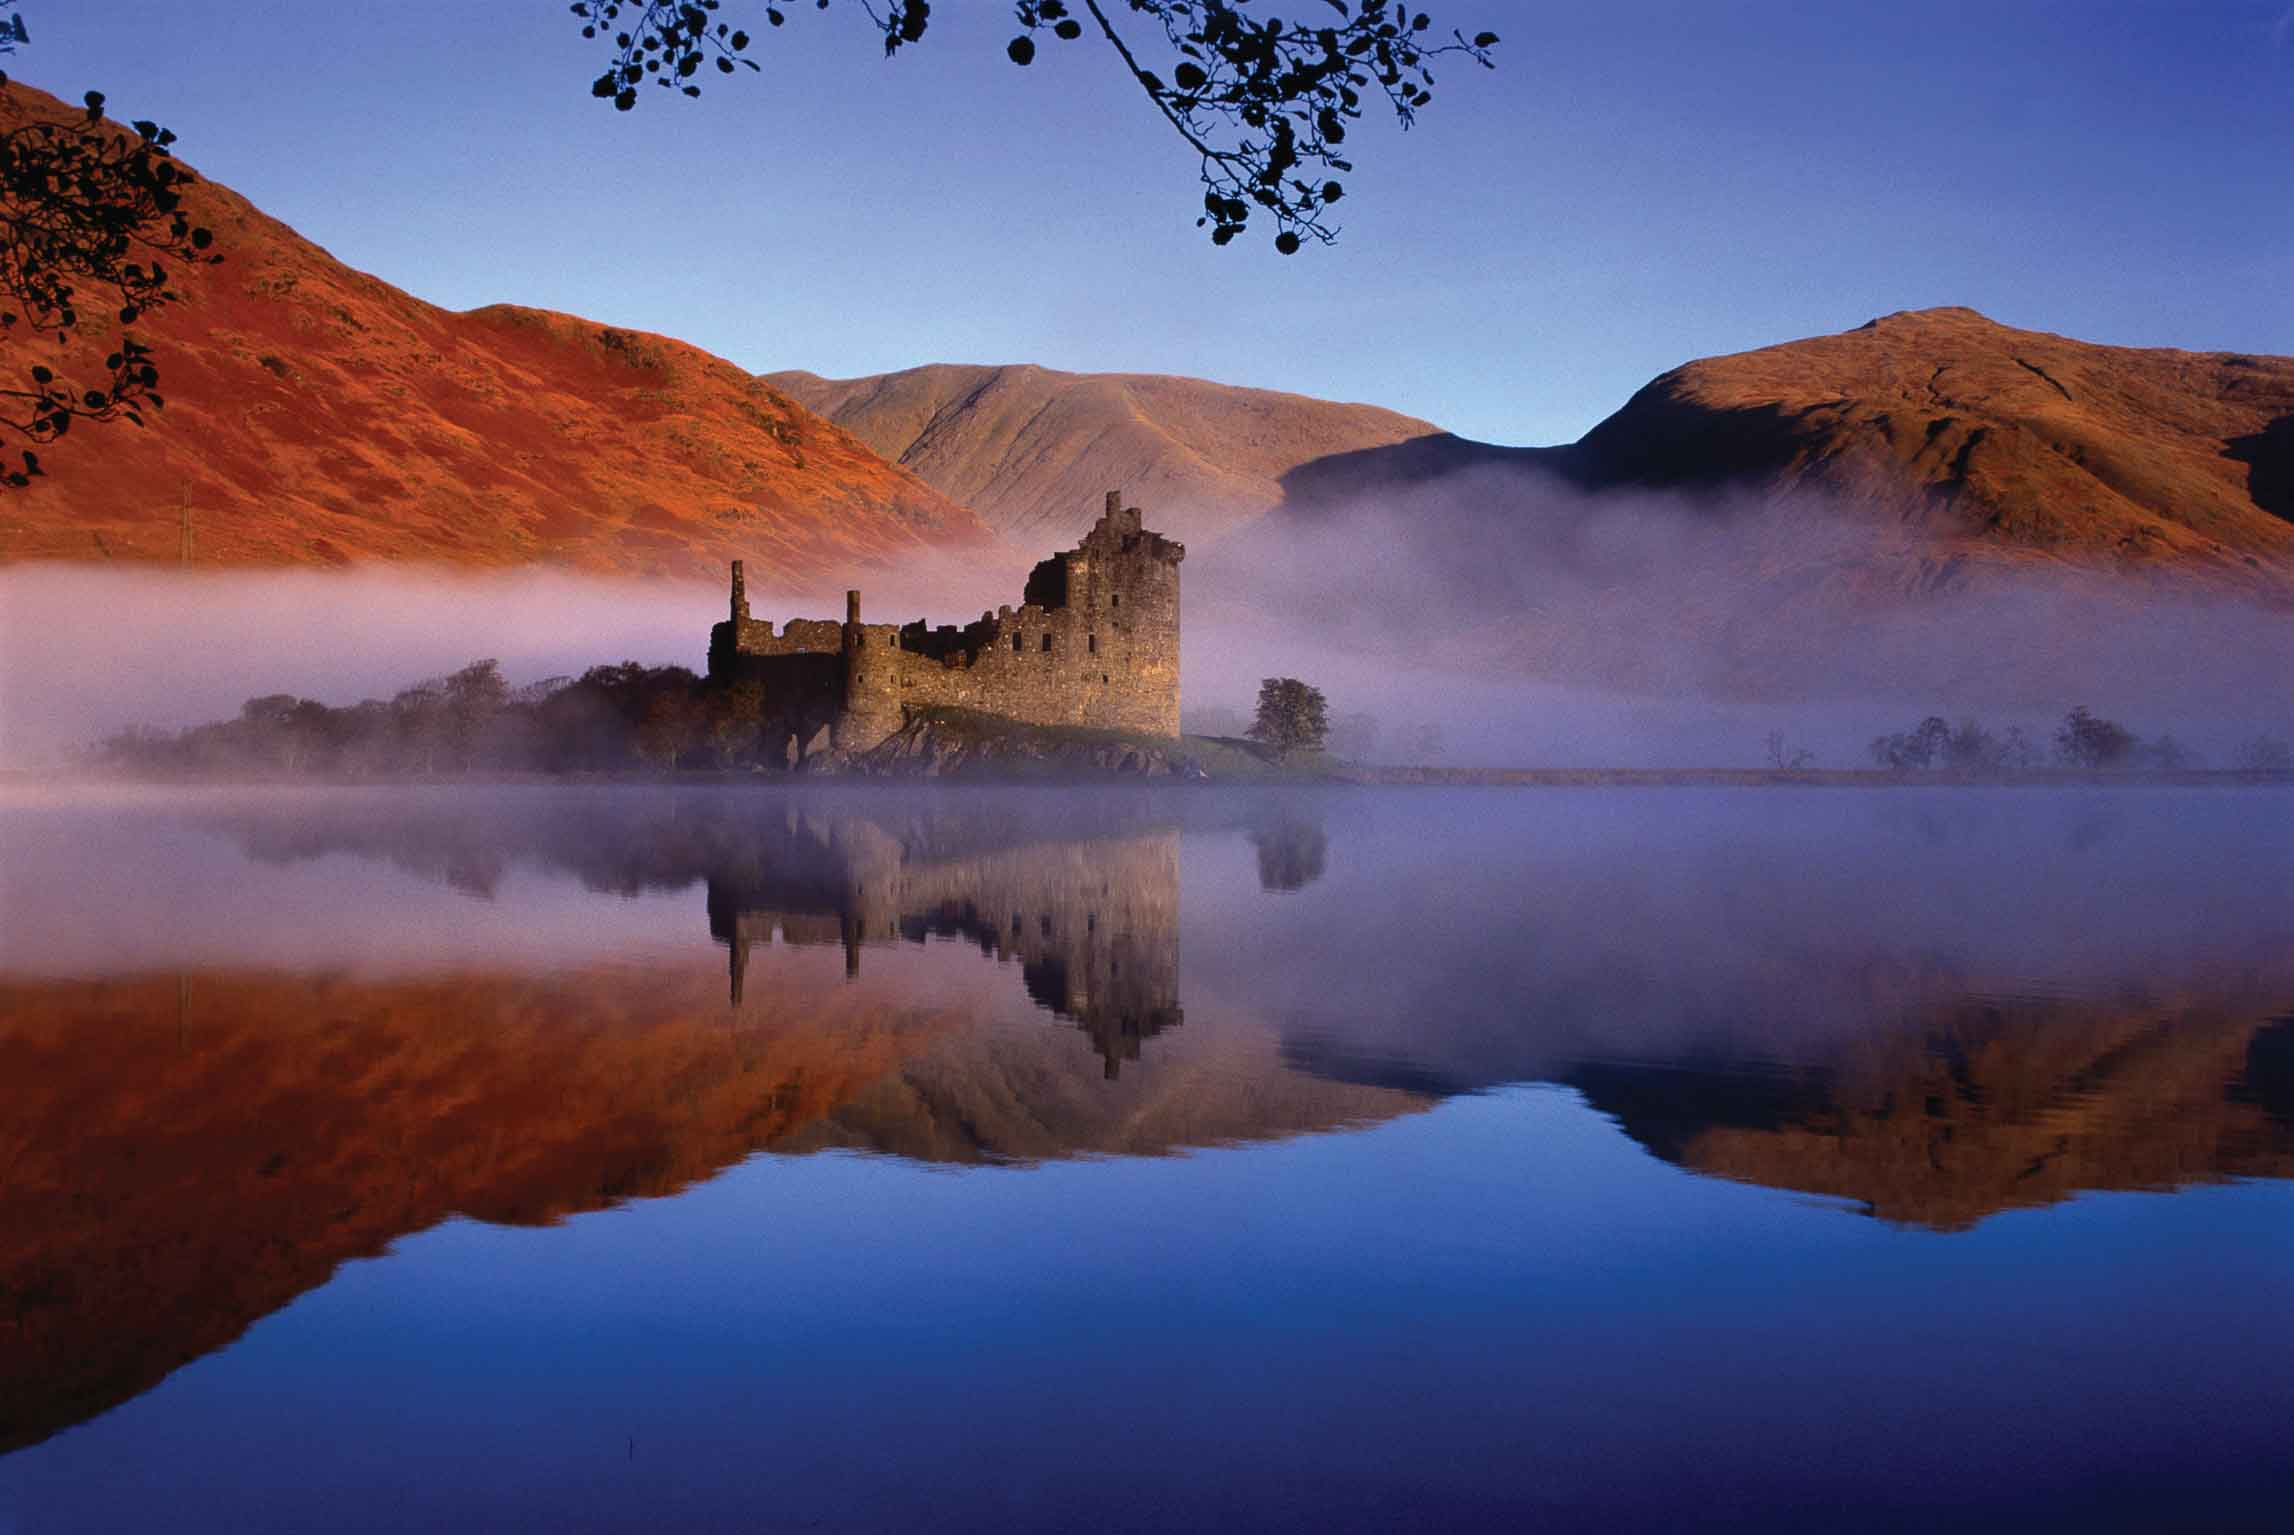 The-Scottish-Highlands-Scotland-North-Coast-500-Route-.jpg